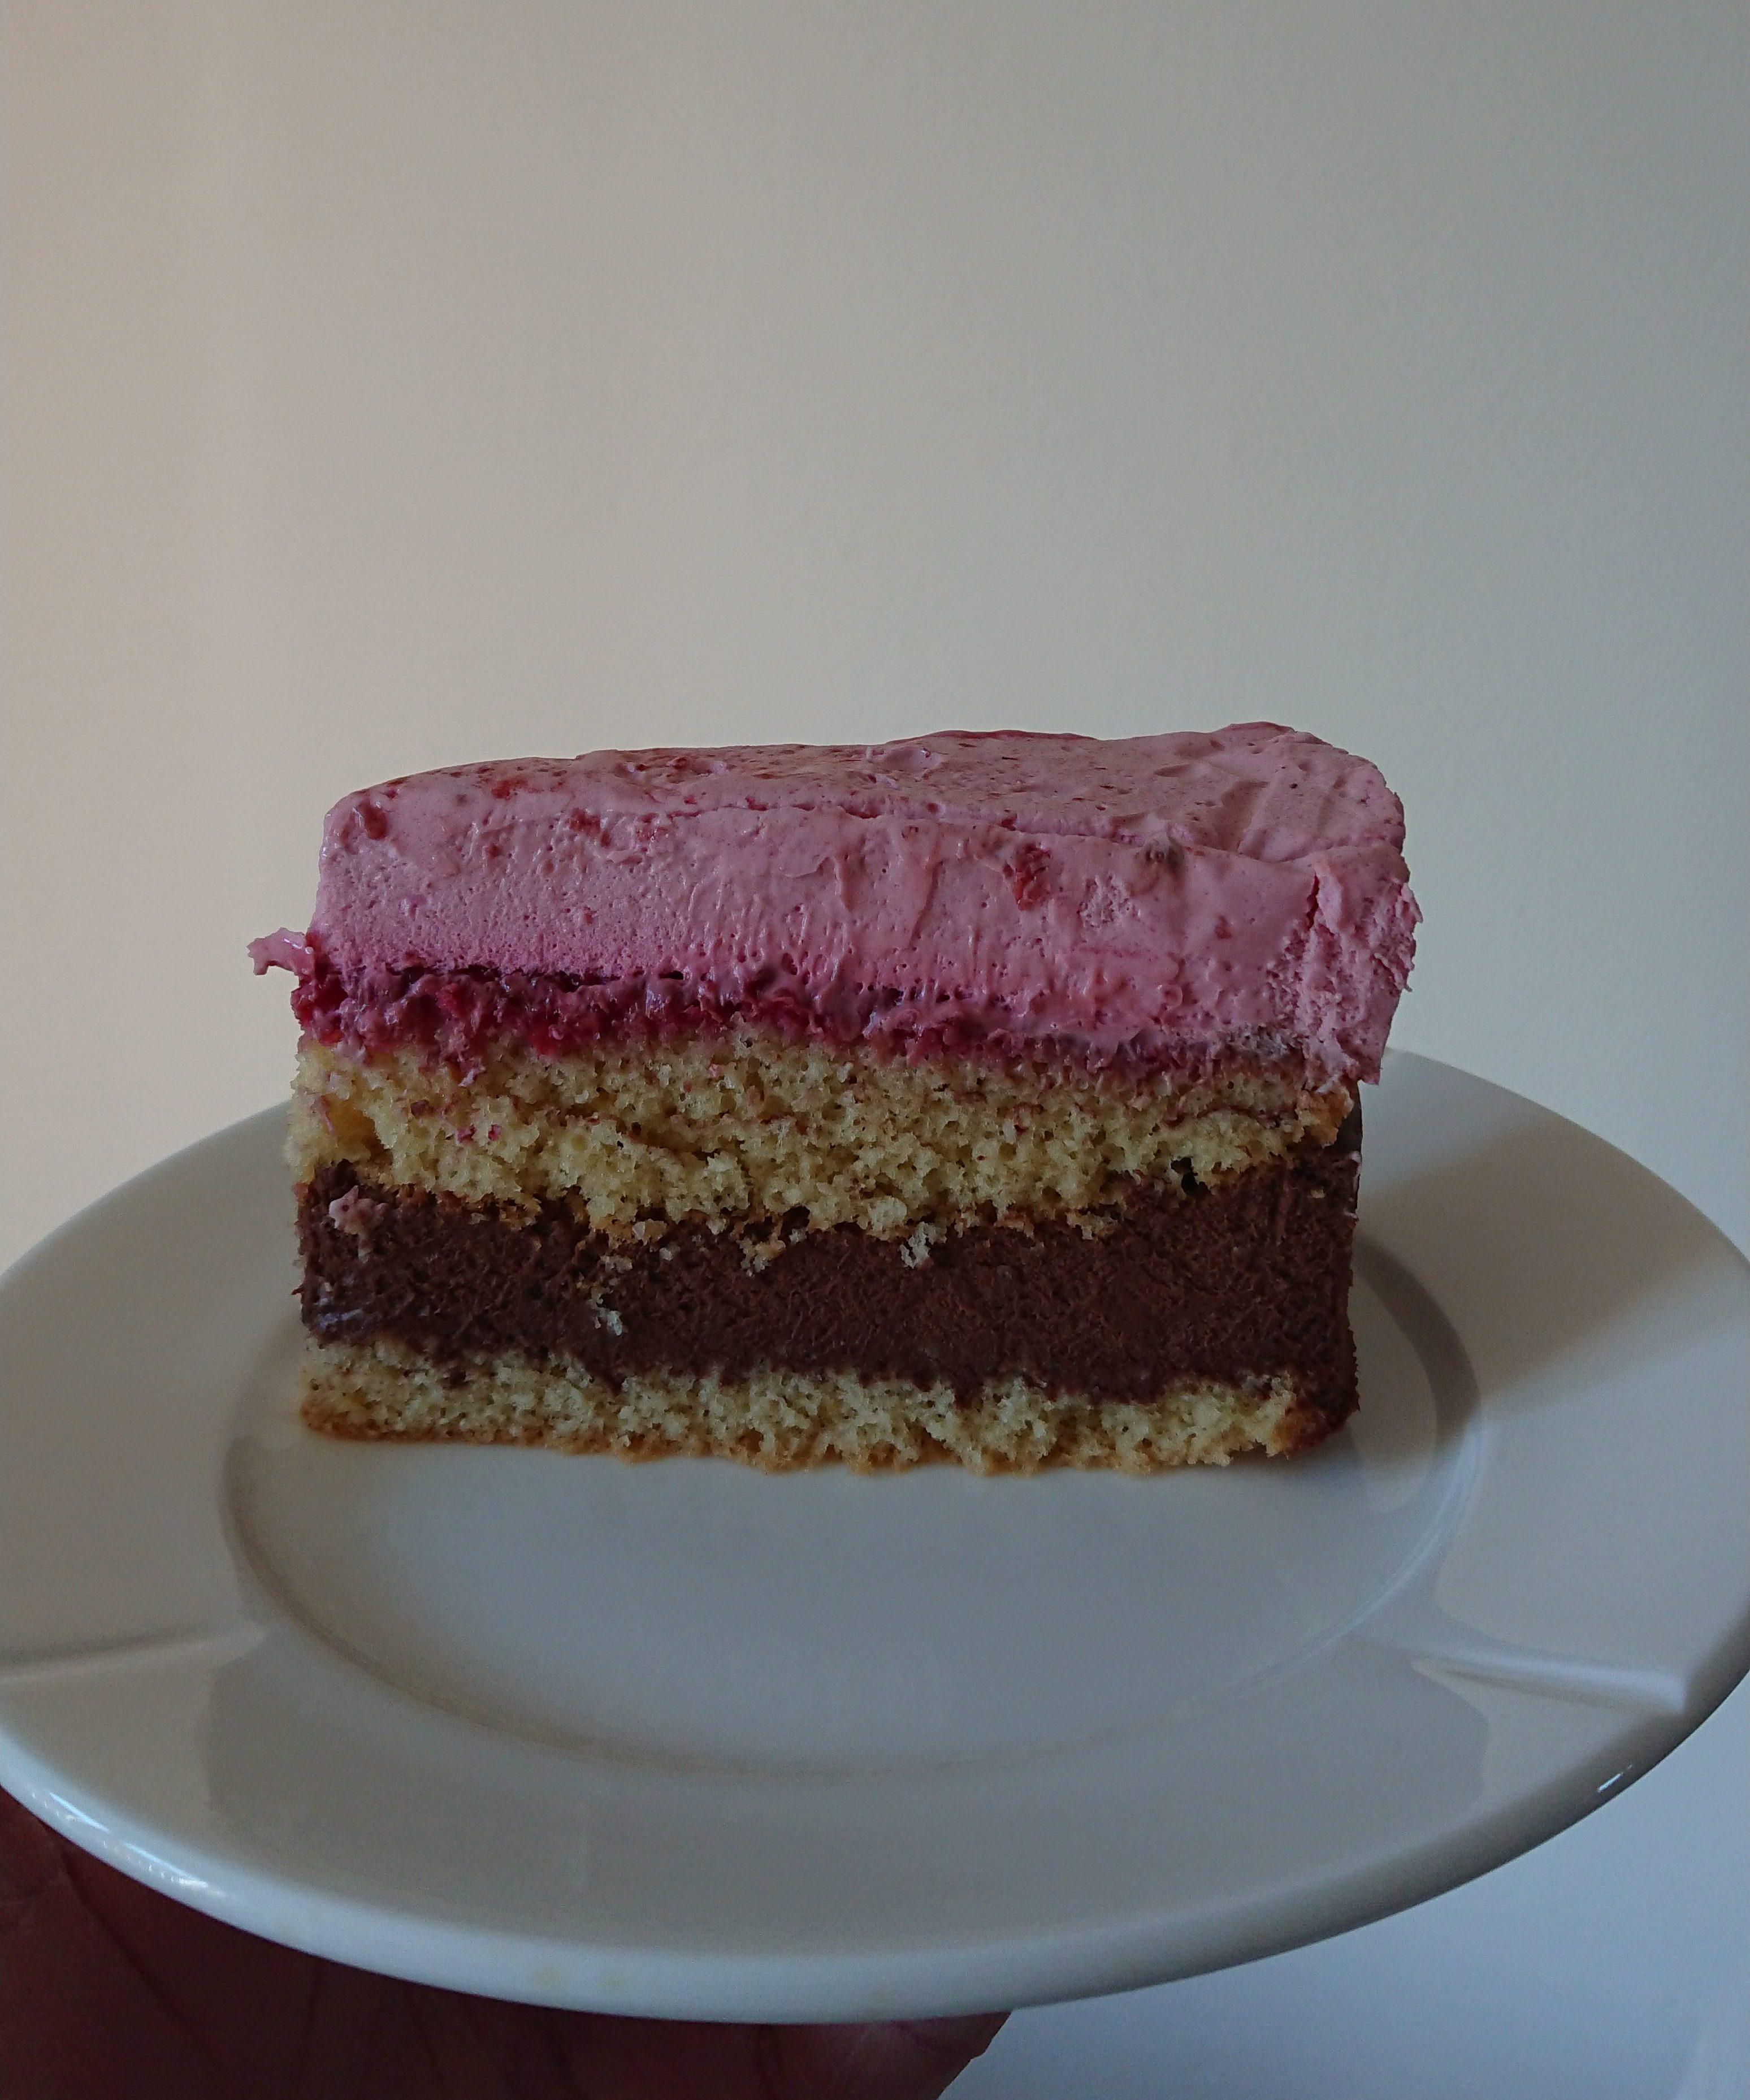 Lagkage med hindbærmousse og mørk chokolademousse